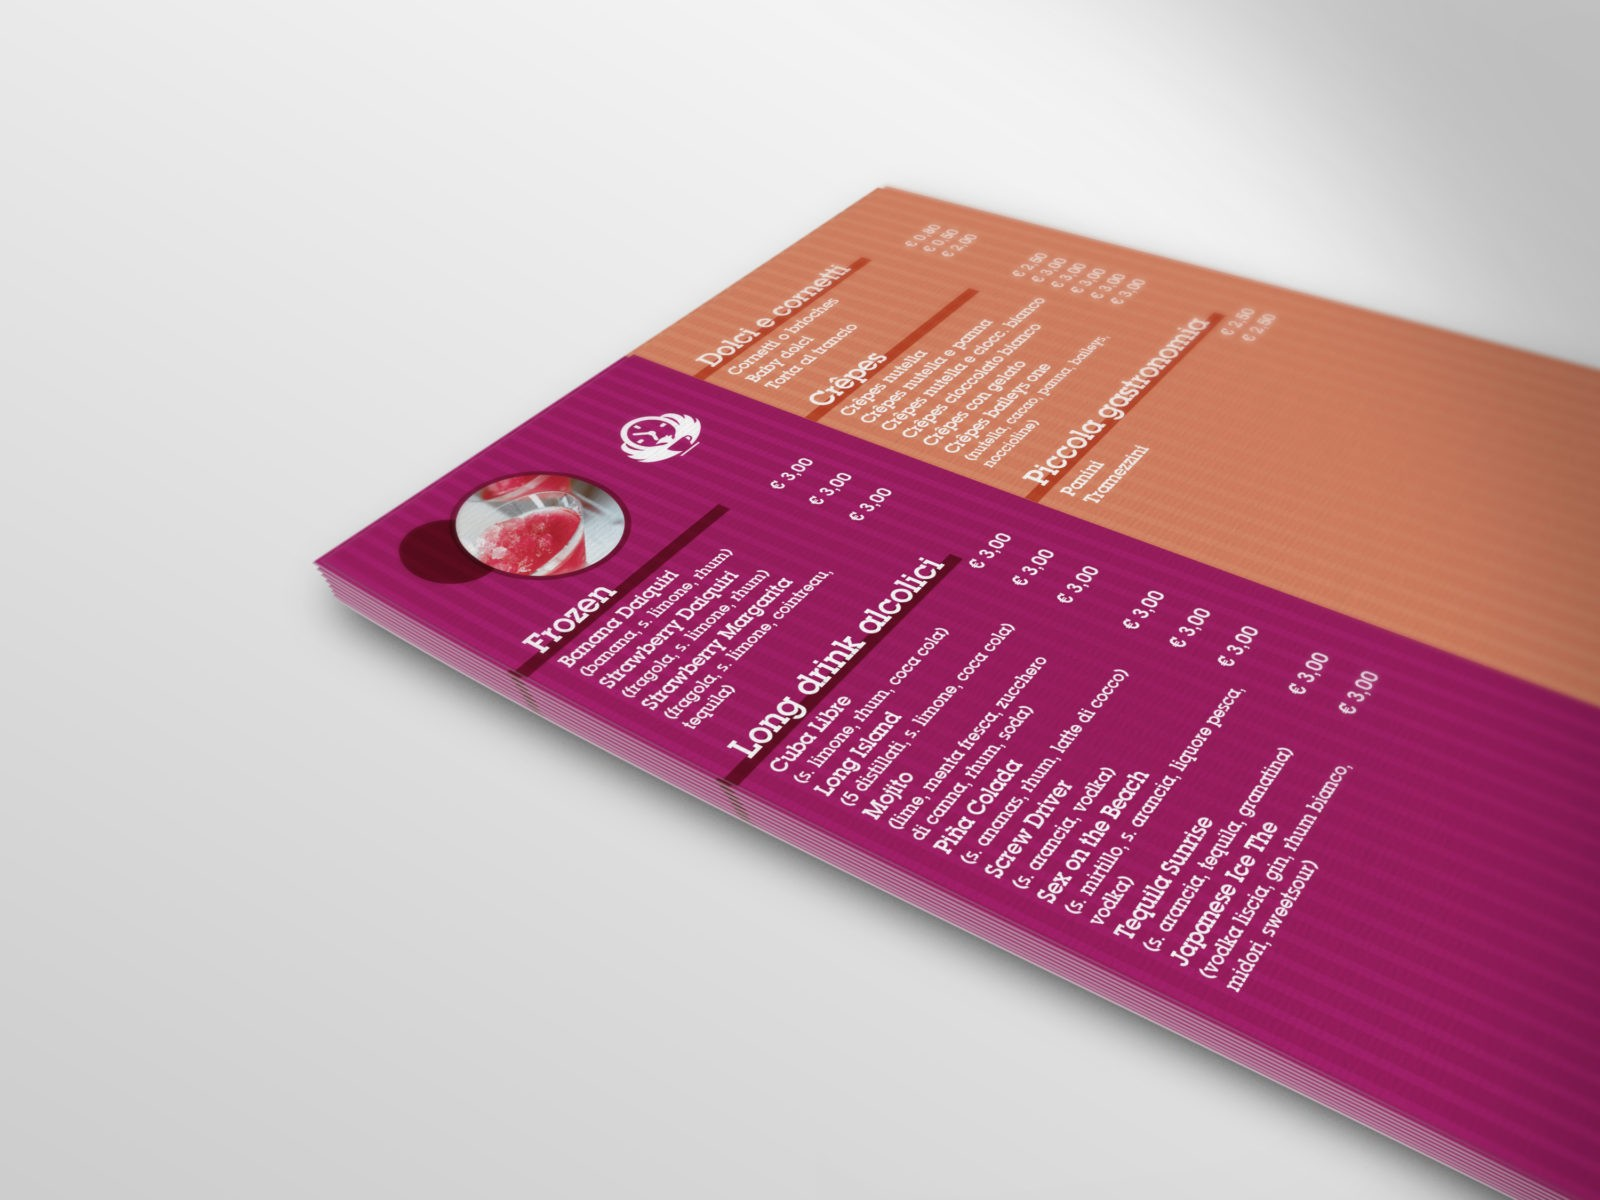 Hera Hora menu